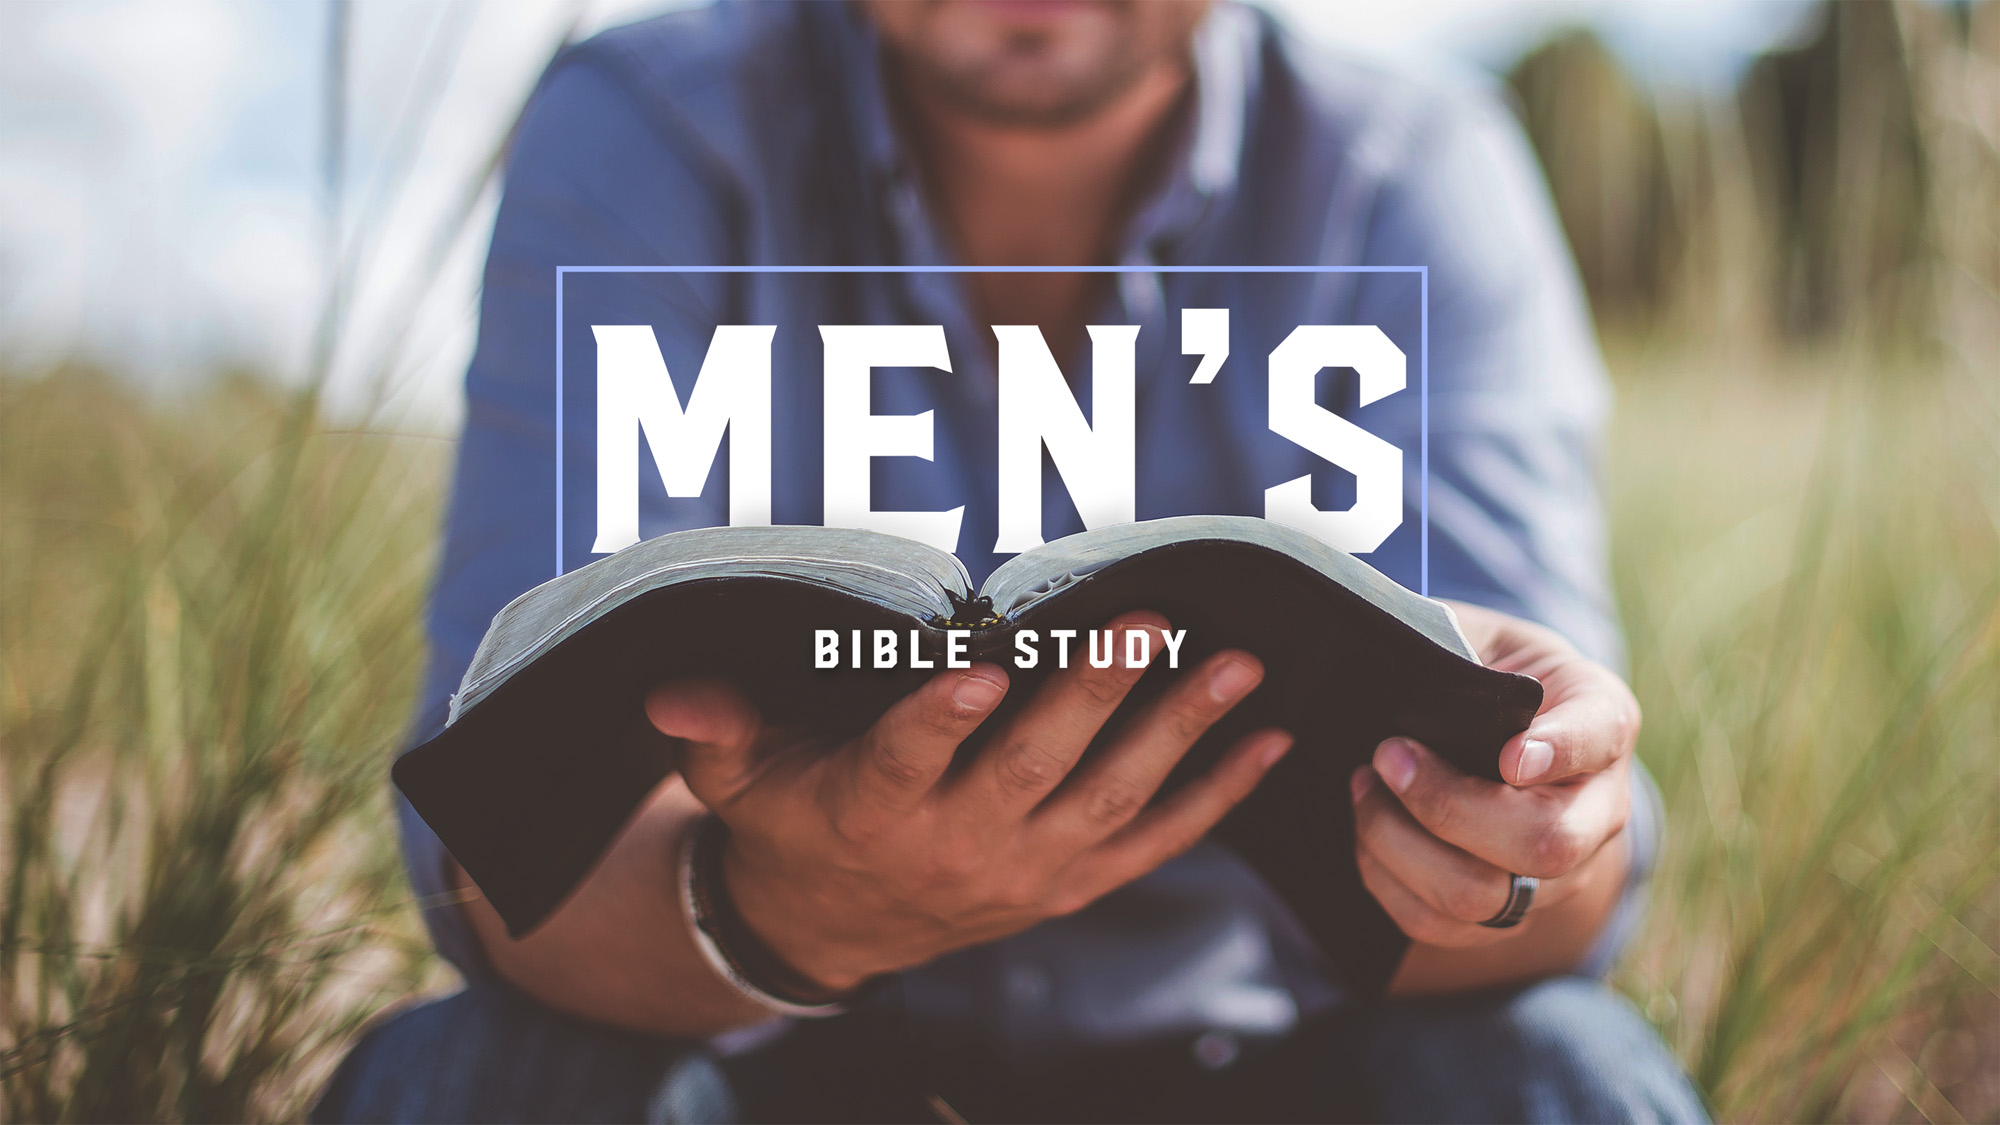 men_s_bible_study-title-1-Wide 16x9.jpg